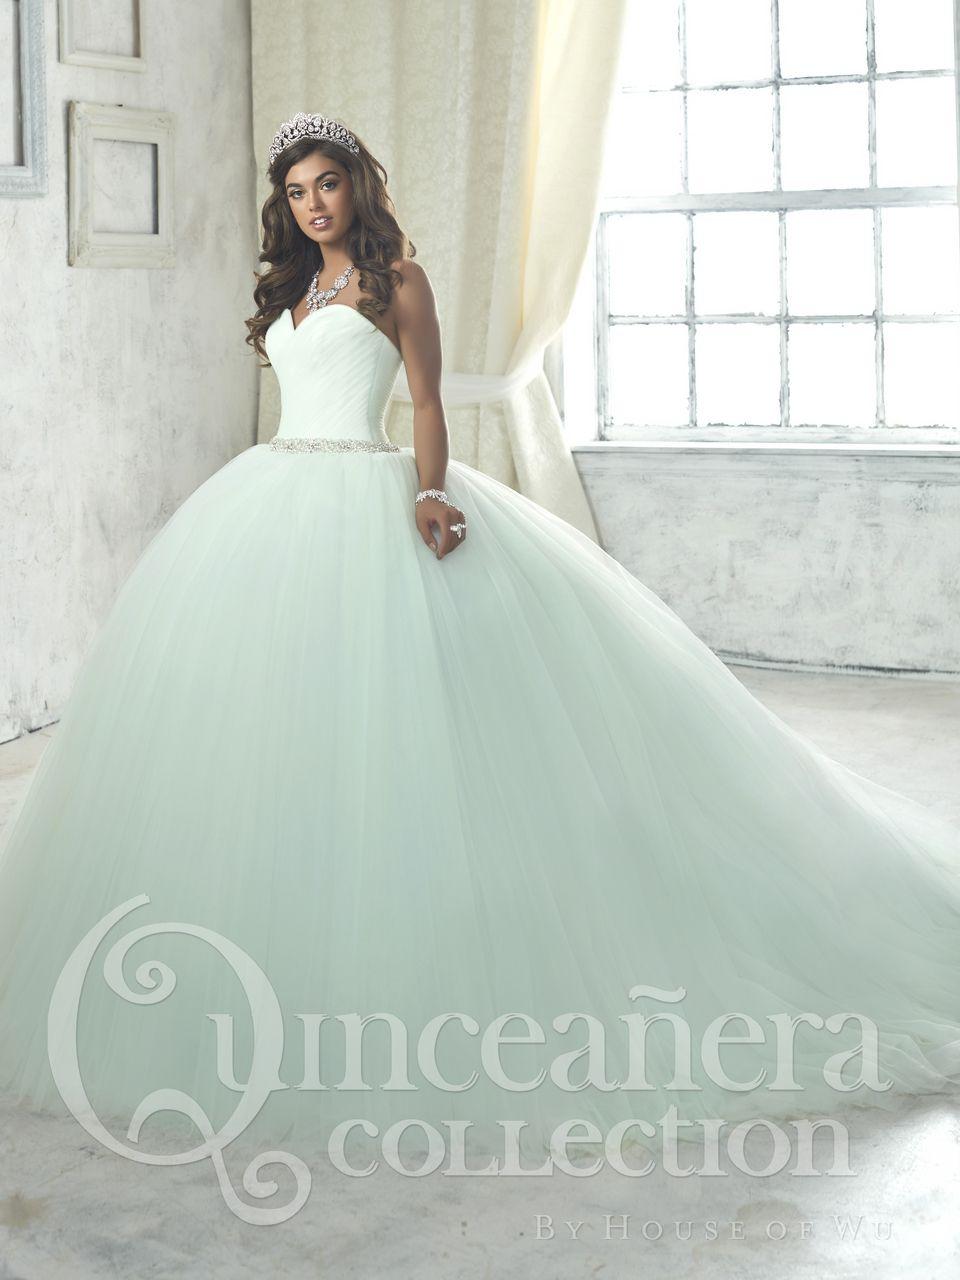 e34de9c06e5 Quinceanera Mall - Quinceanera Dress